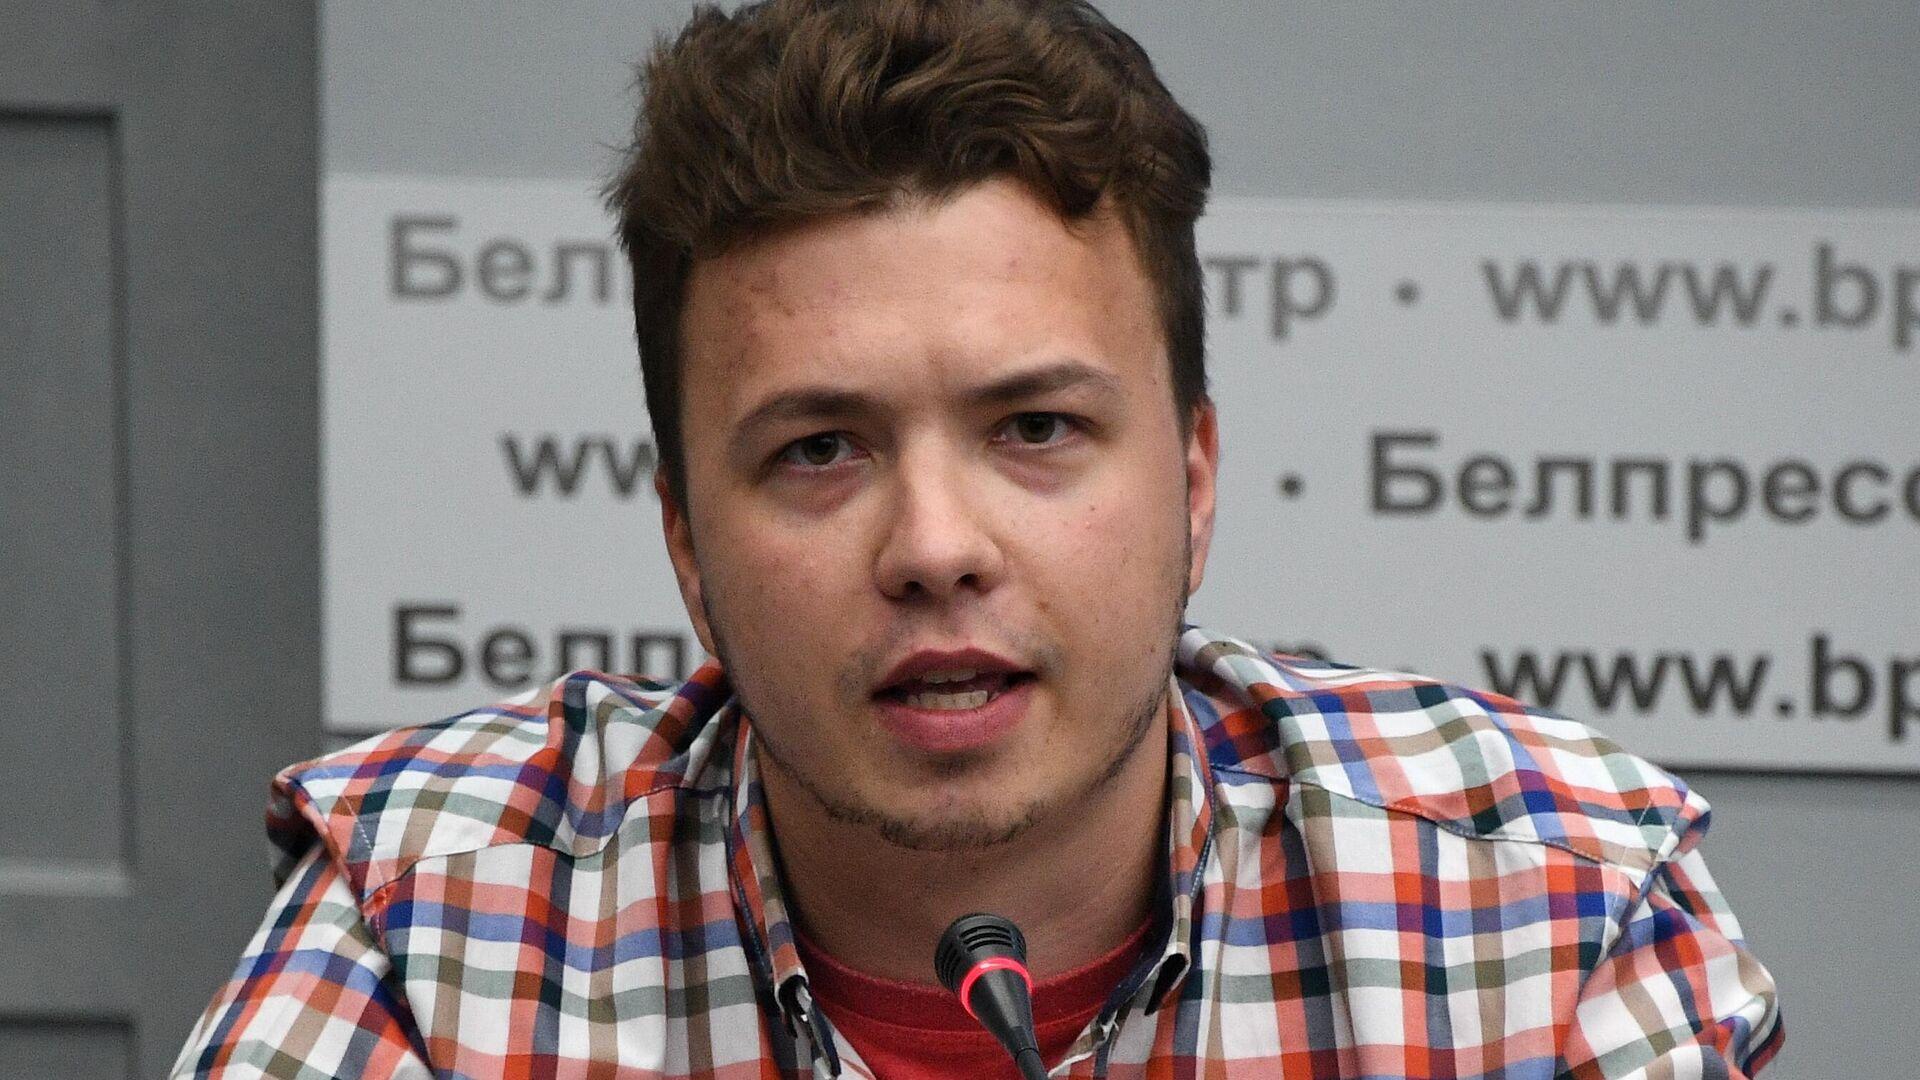 El periodista bielorruso Román Protasévich - Sputnik Mundo, 1920, 25.06.2021